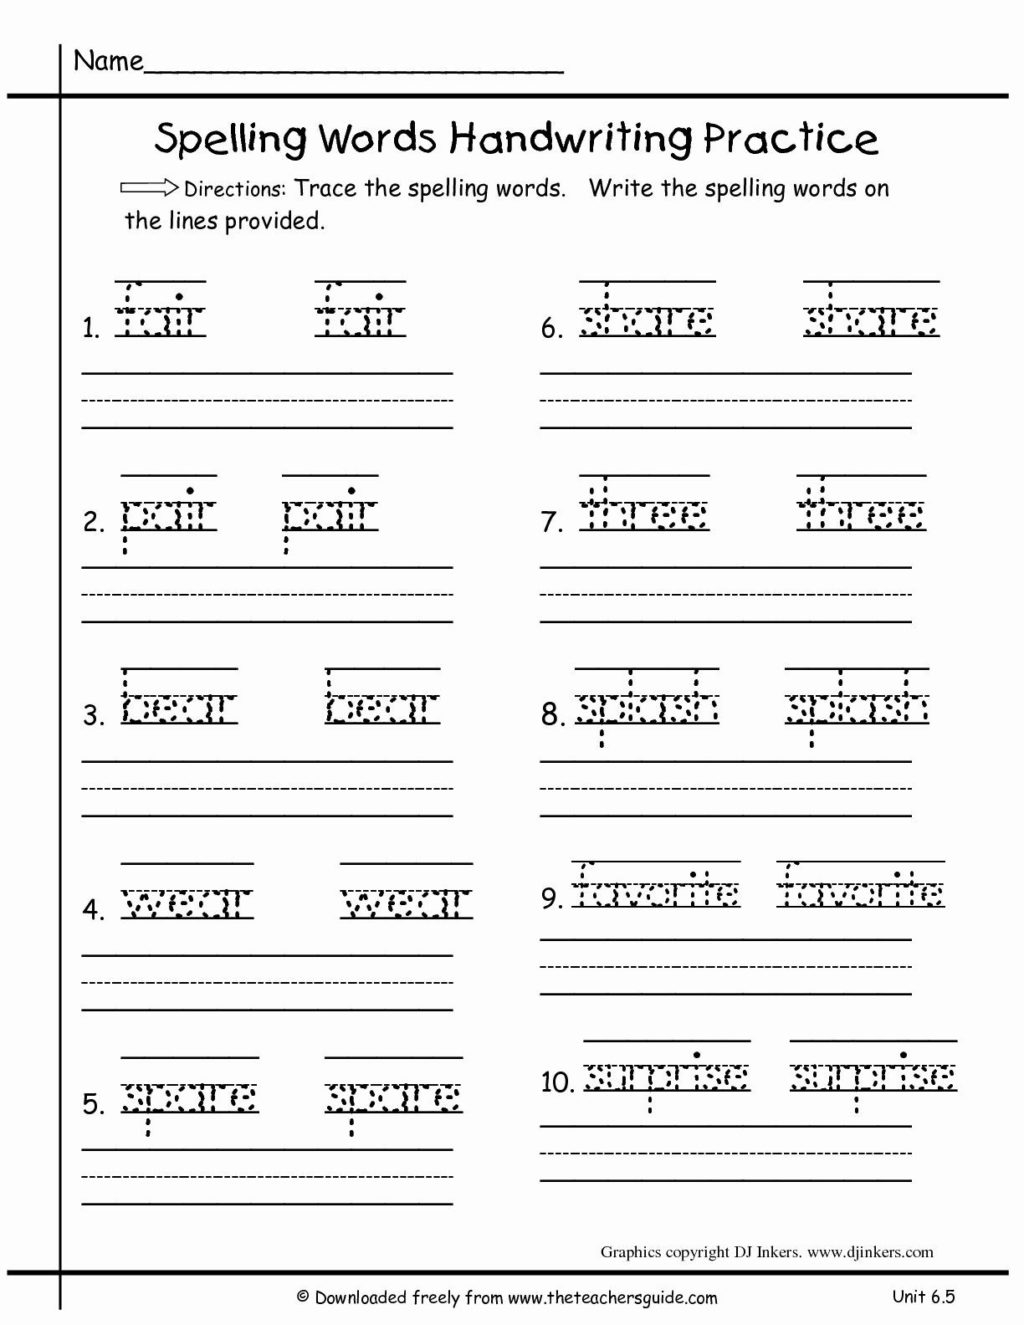 Worksheet ~ 1St Grade Writing Worksheets To Download Free